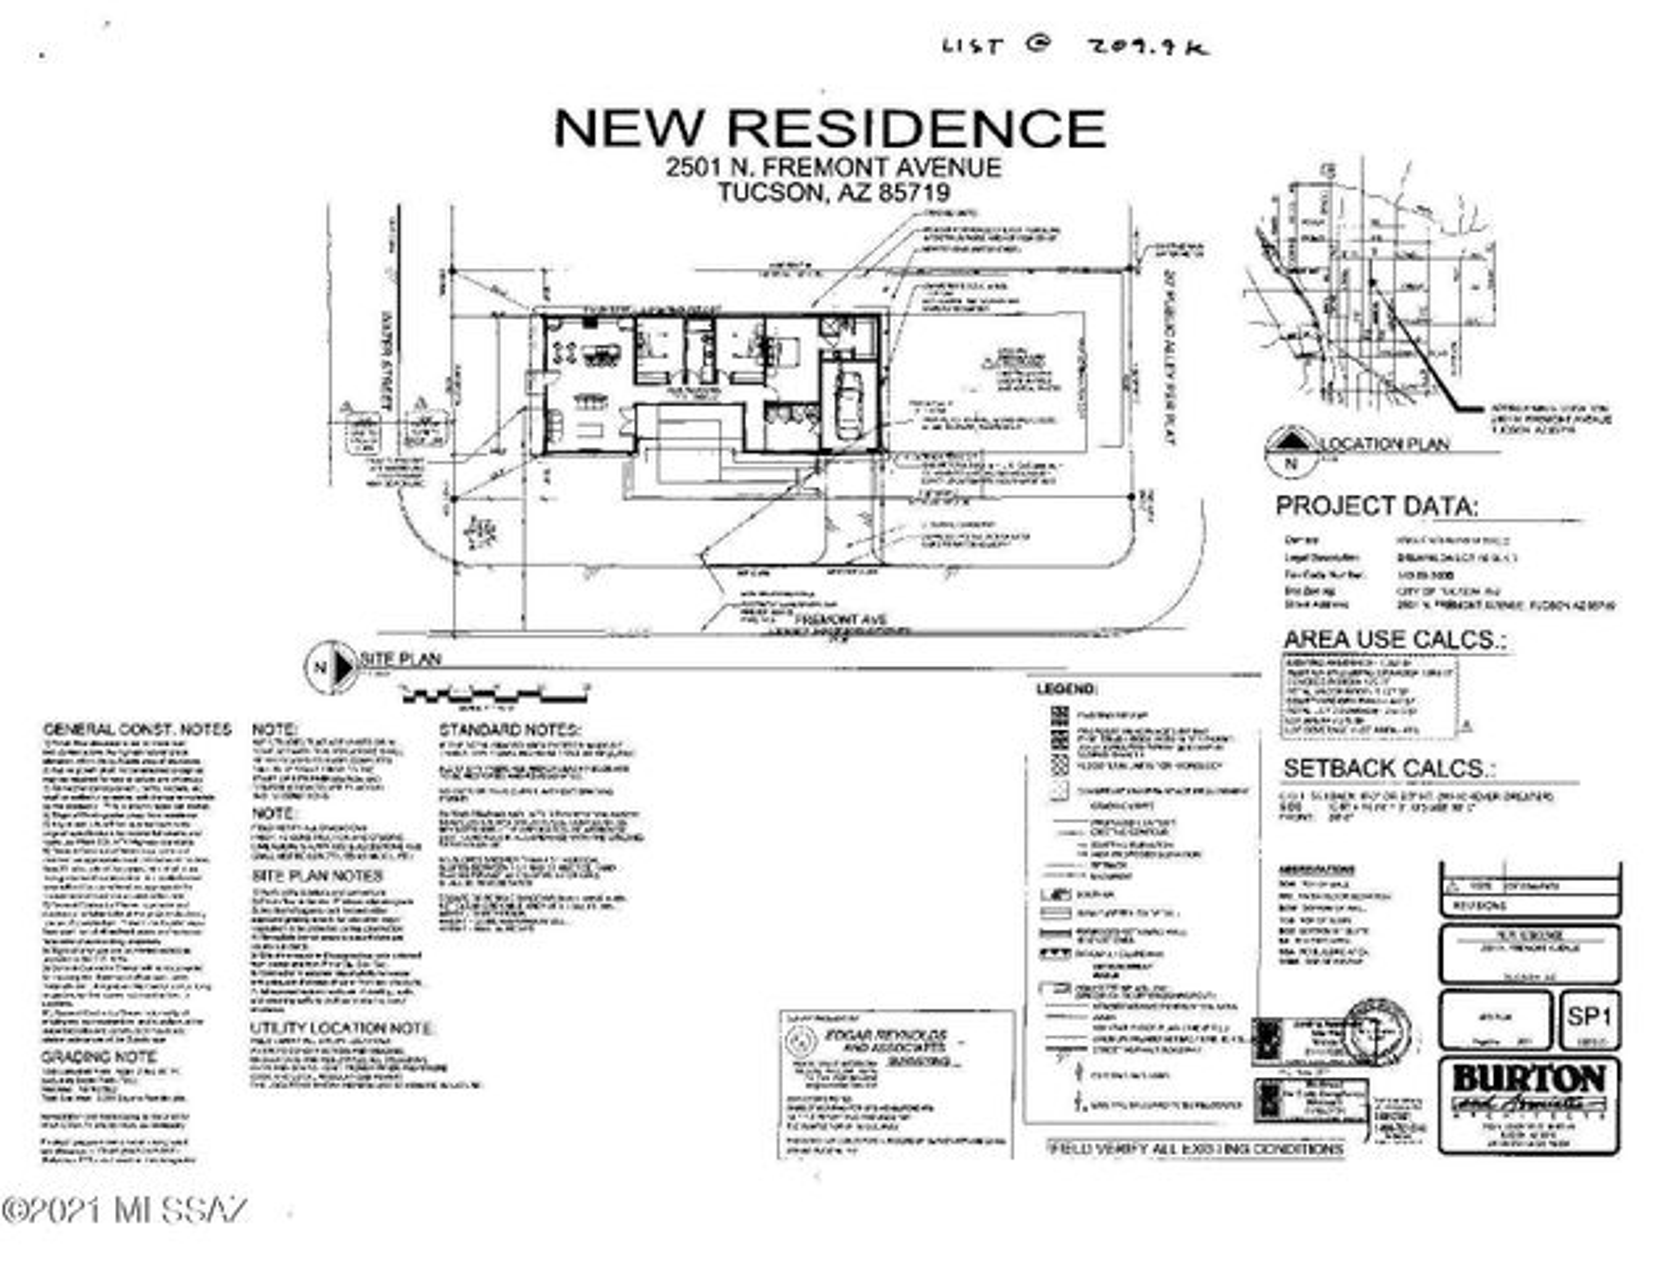 2501 N Fremont Avenue, Tucson, AZ 85719